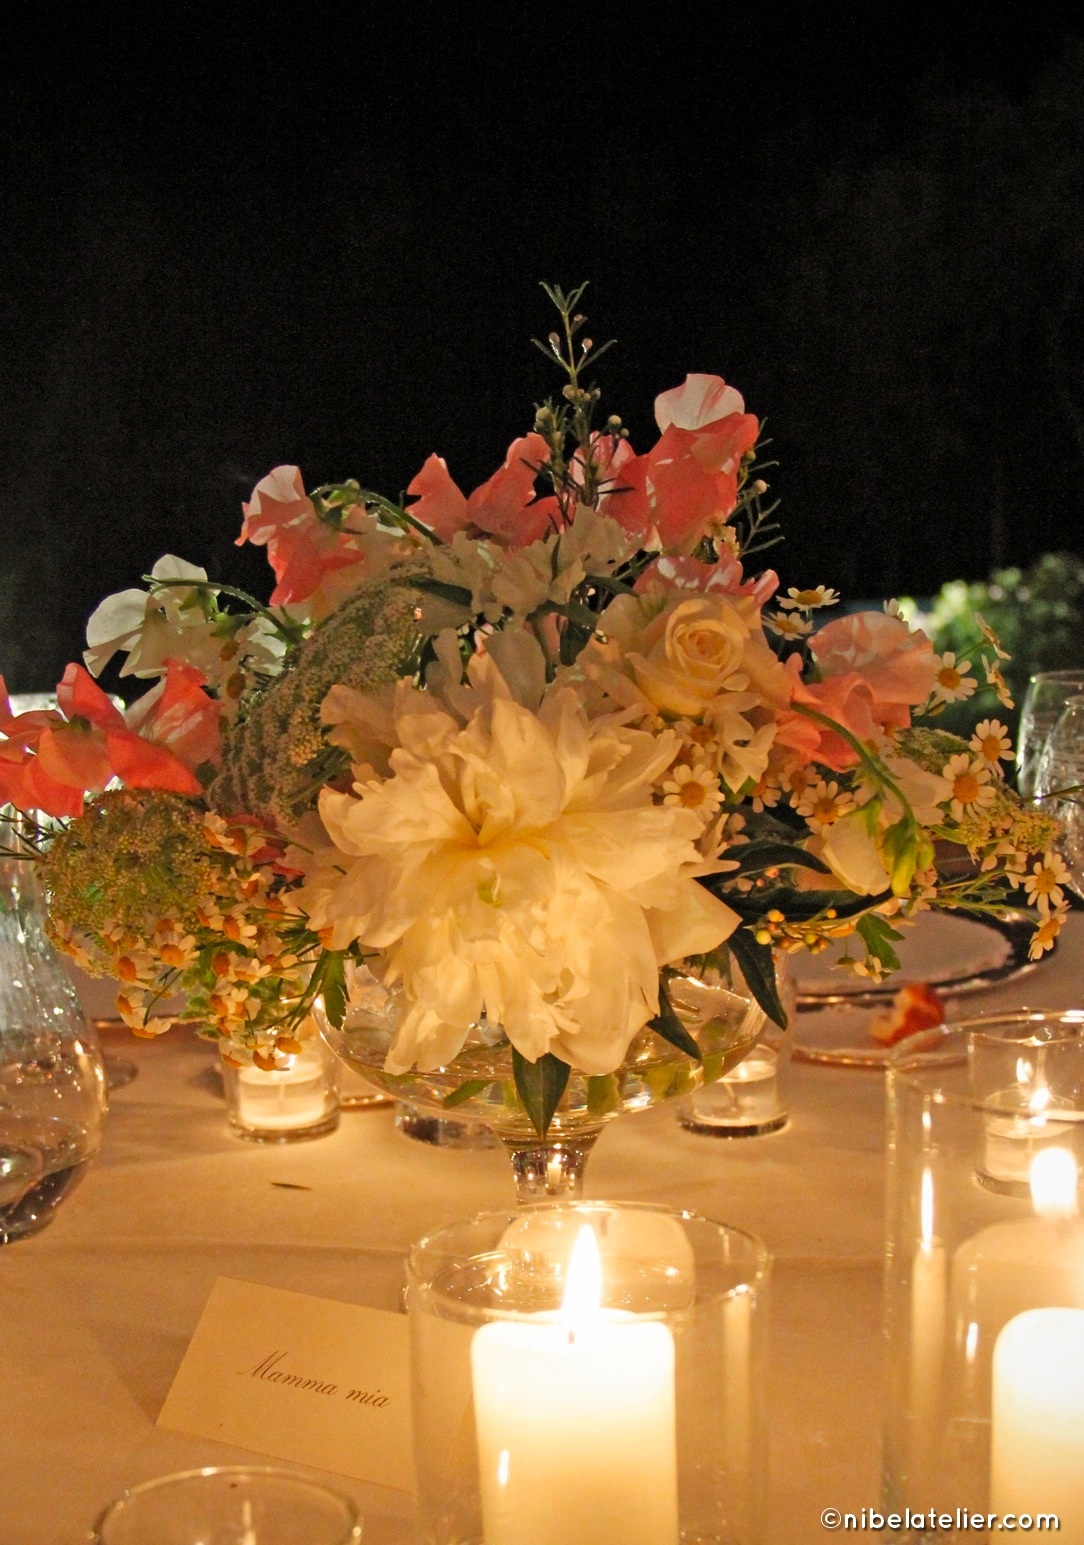 ricevimento-centrotavola-notte-candele